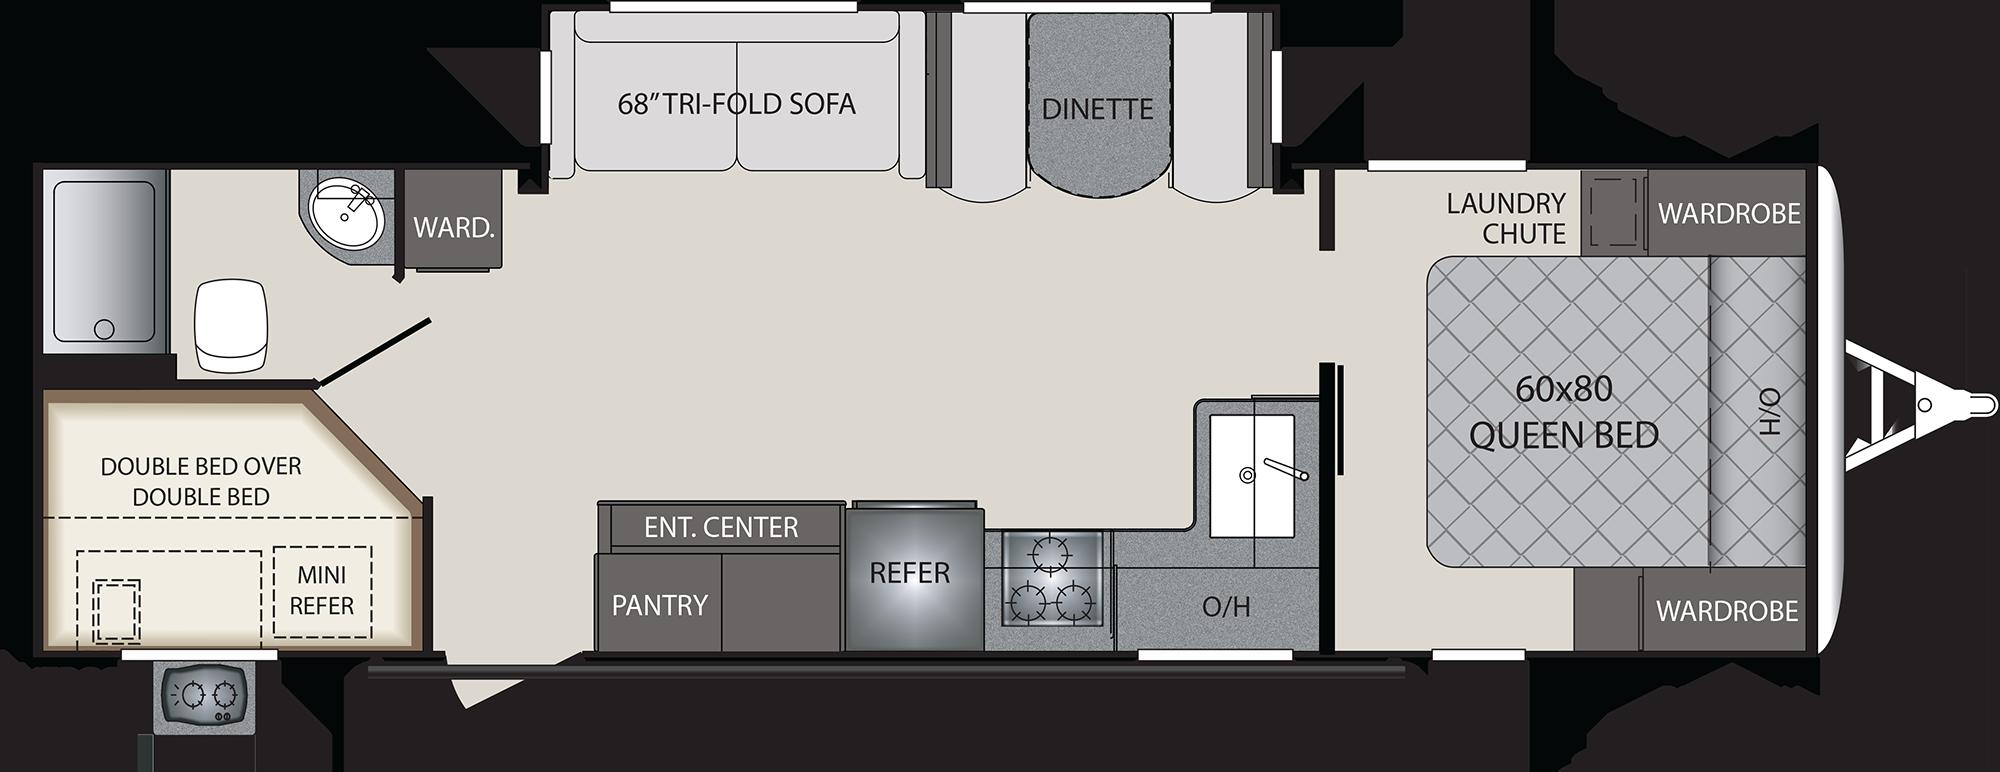 2019 KEYSTONE PREMIER 29BHPR (bunks) Floorplan